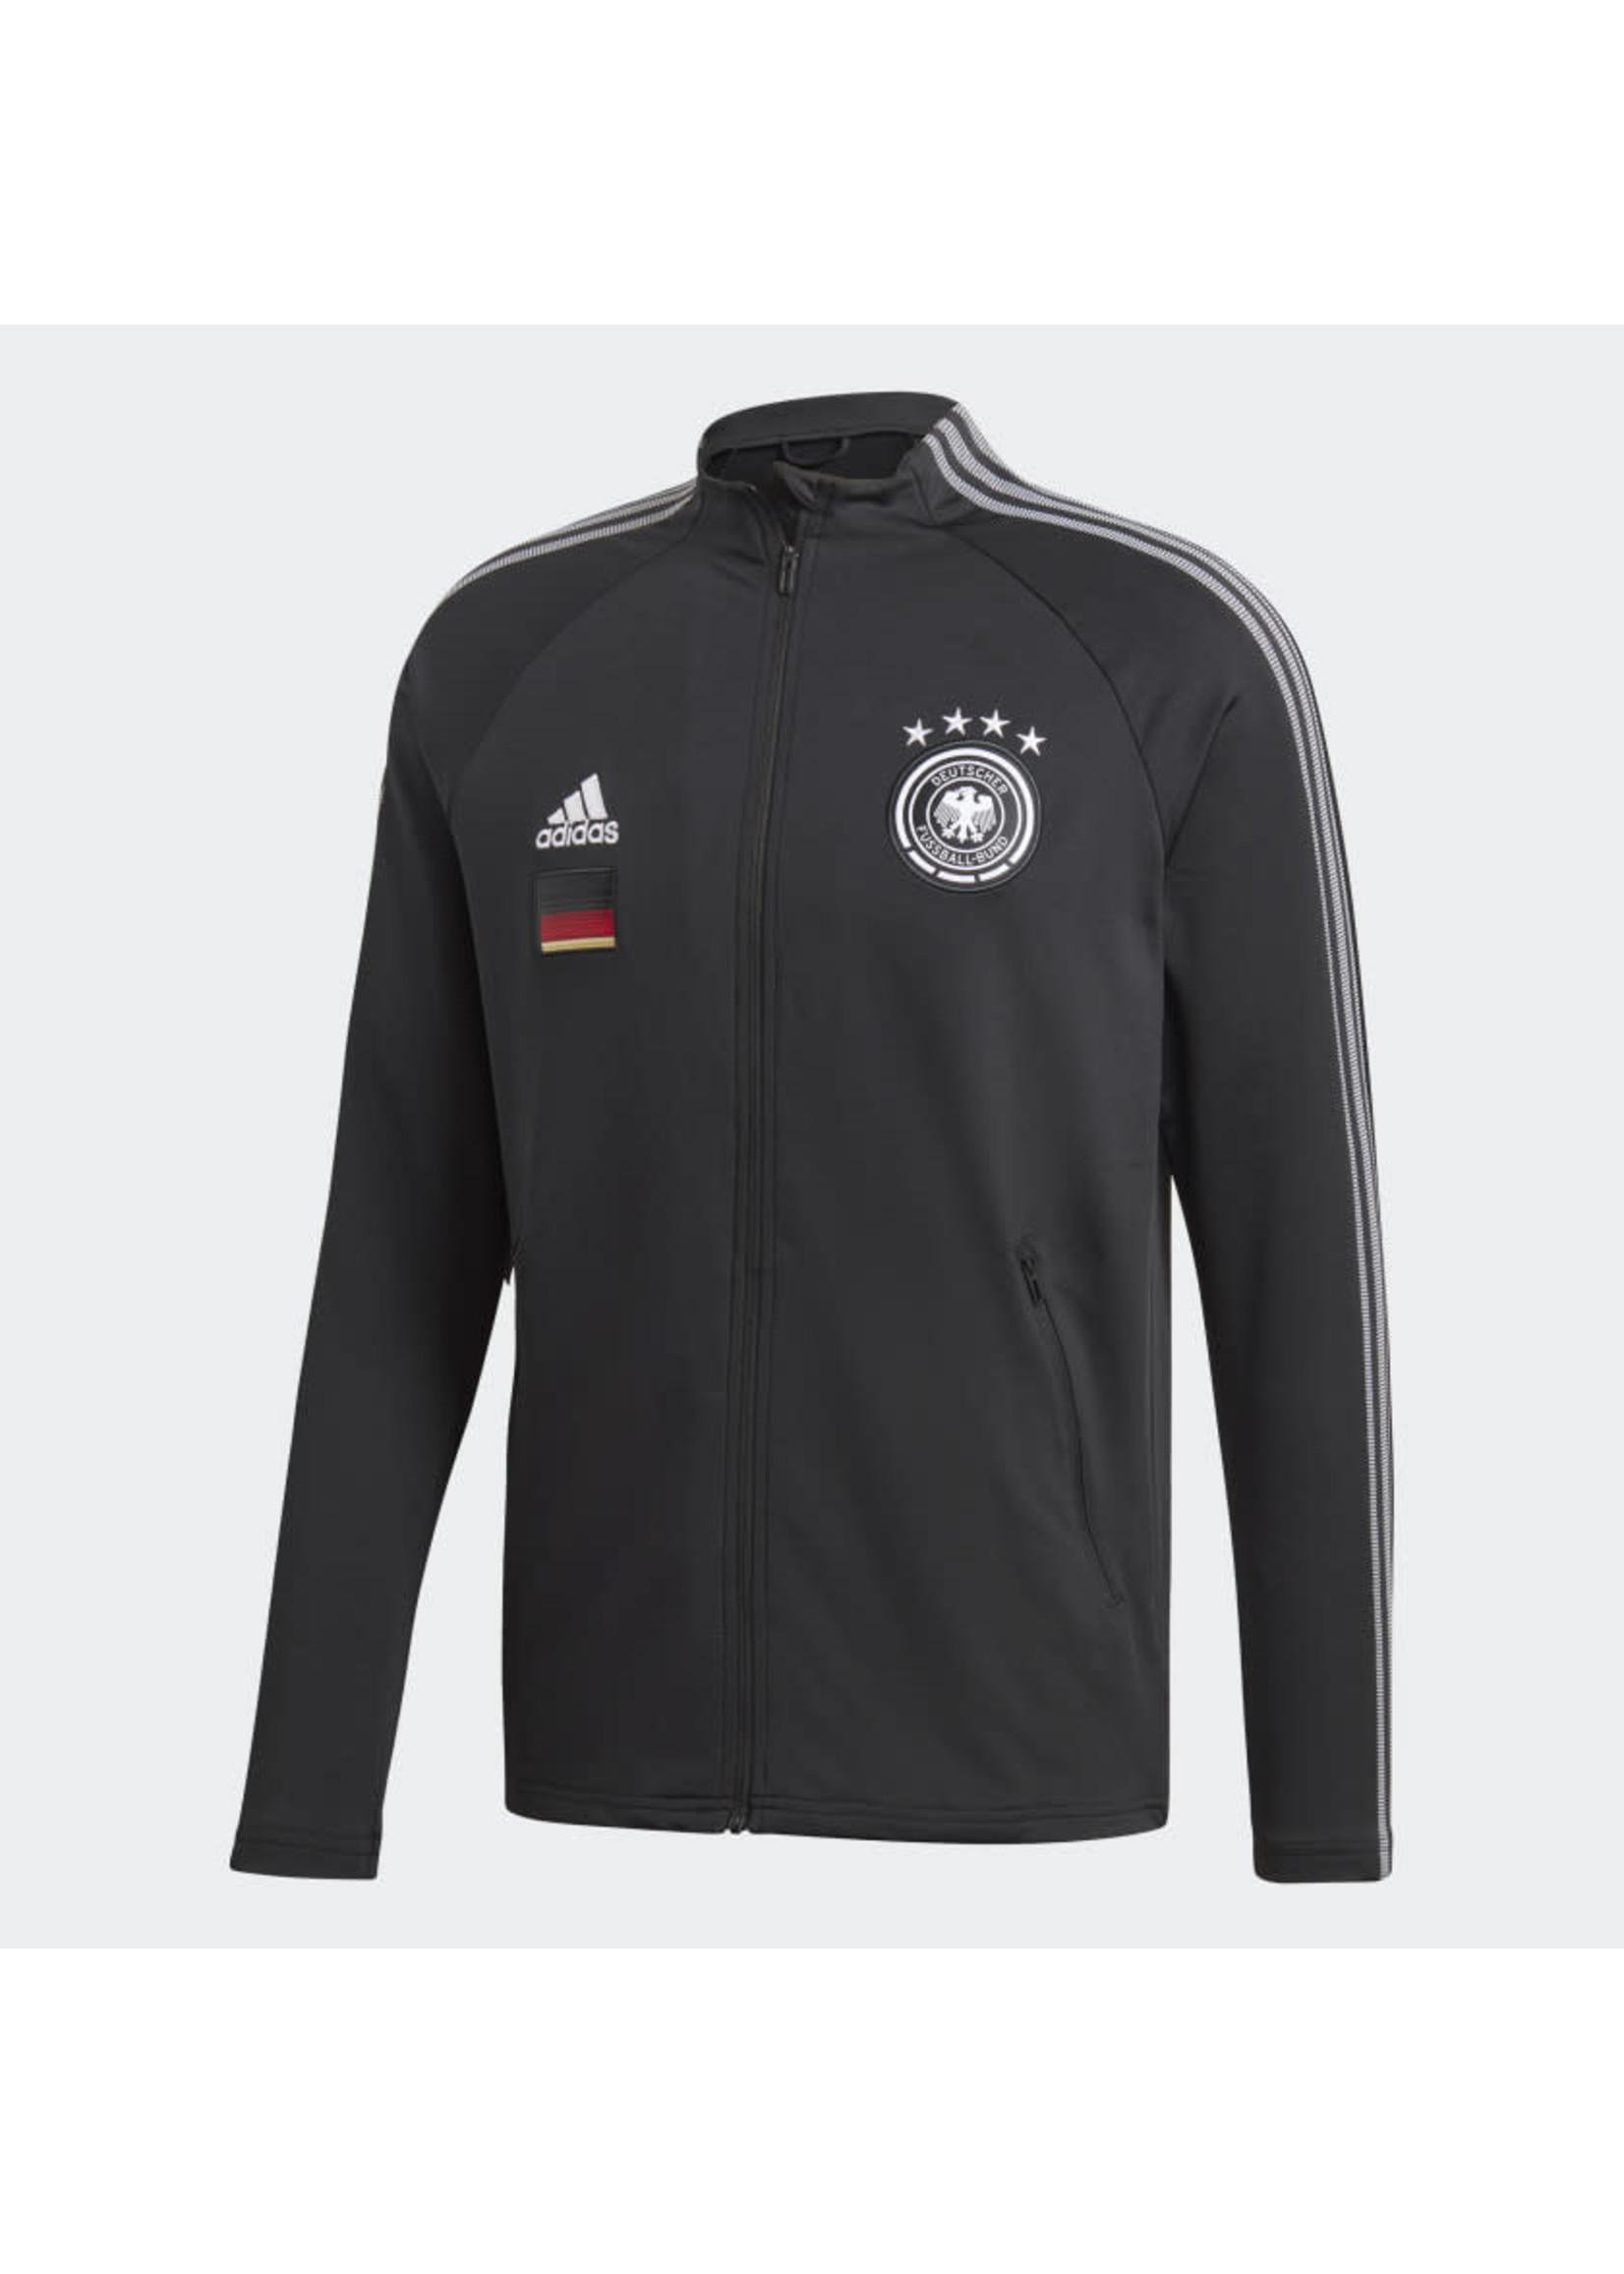 Adidas Germany Track Jacket - Full Zip - FI1453